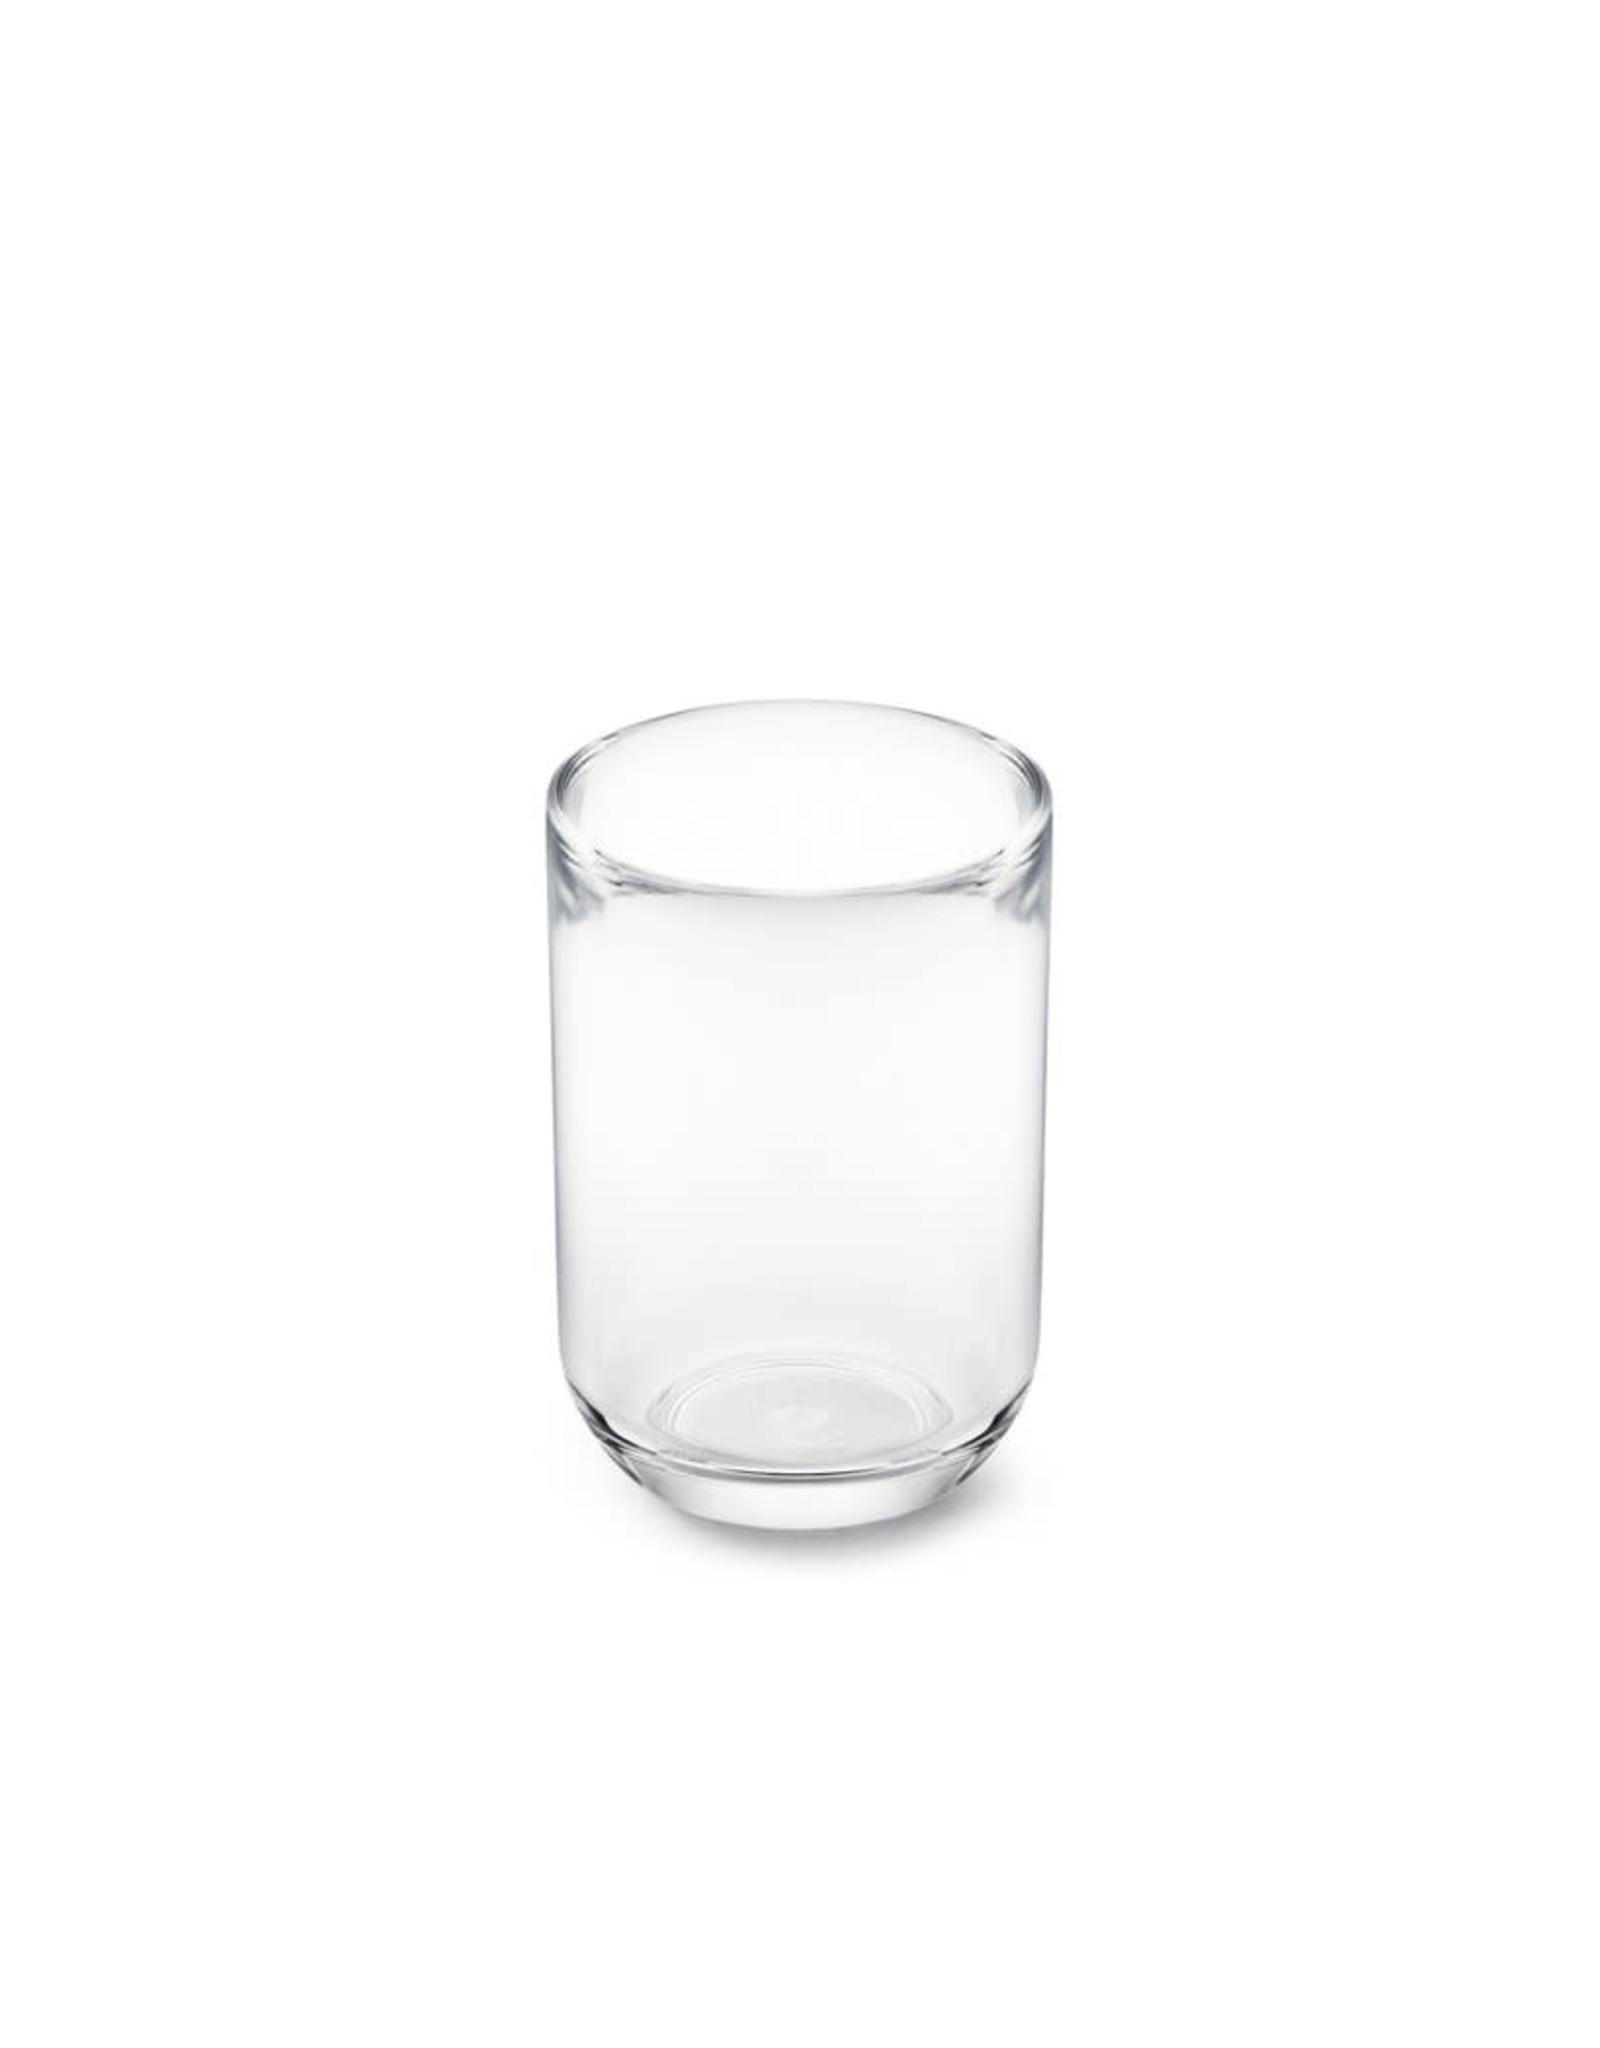 Junip Tumbler in Clear Acrylic